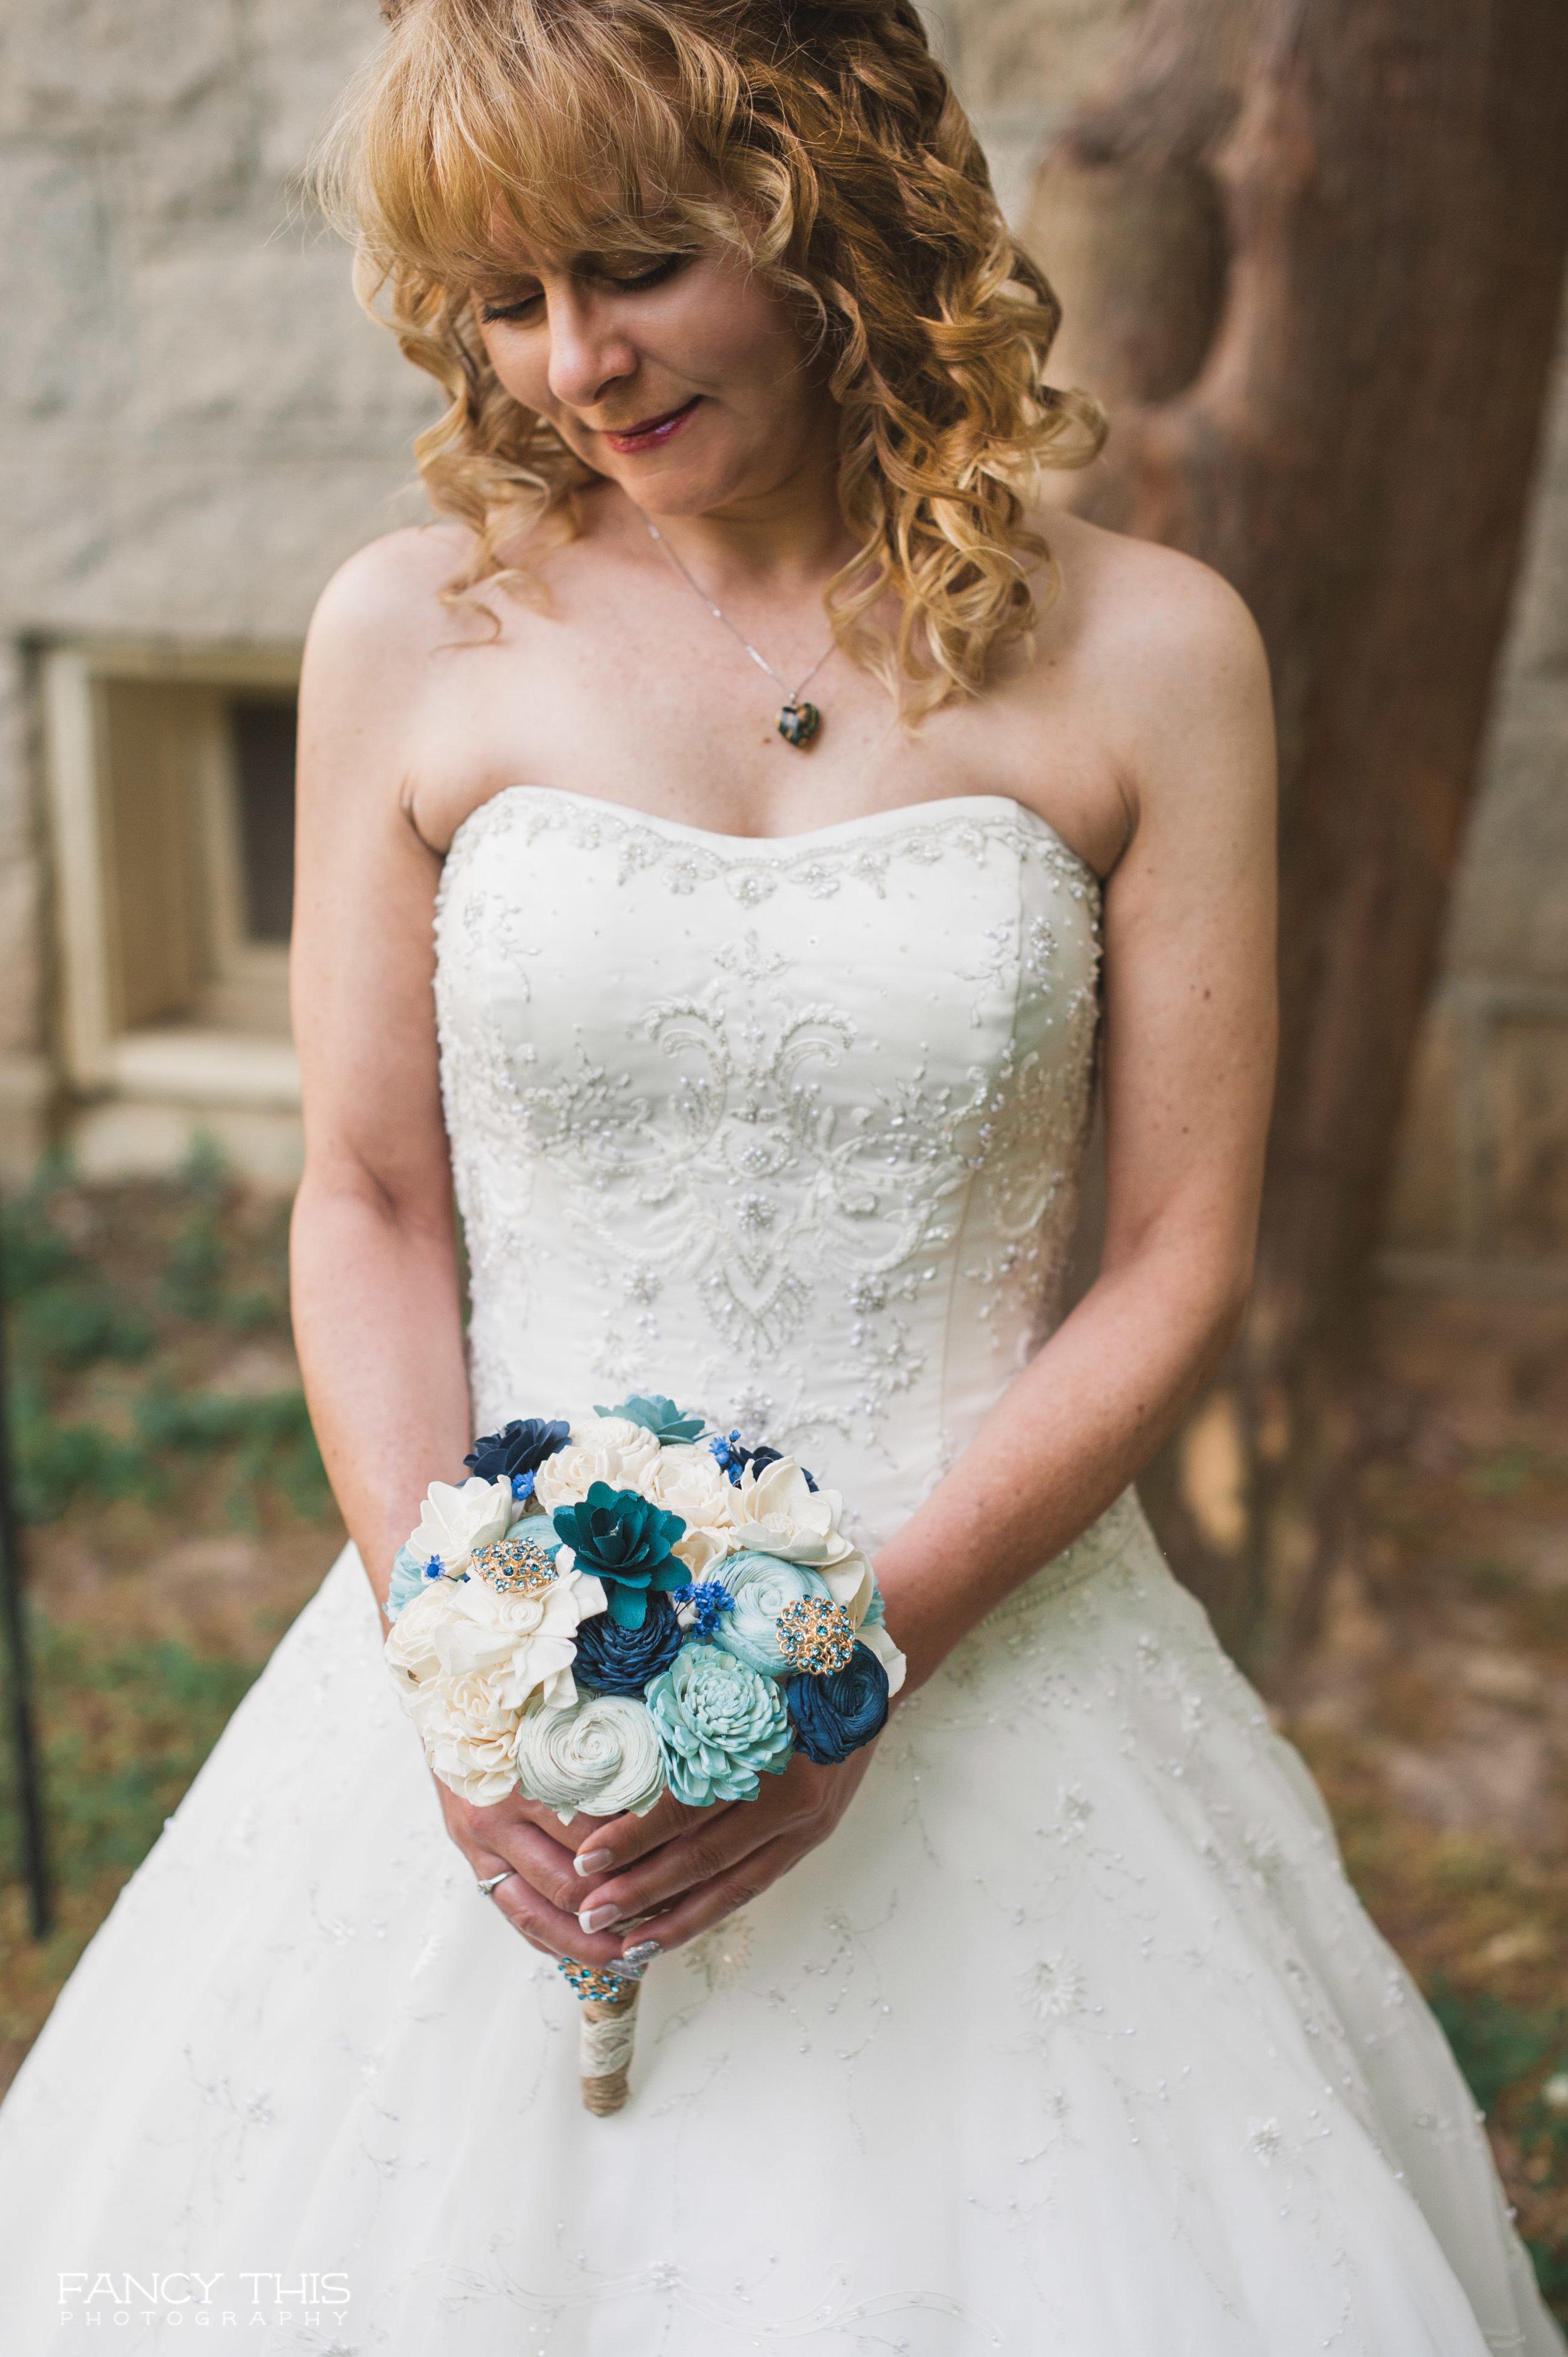 courtneyjasonwedding_socialmediaready050.jpg